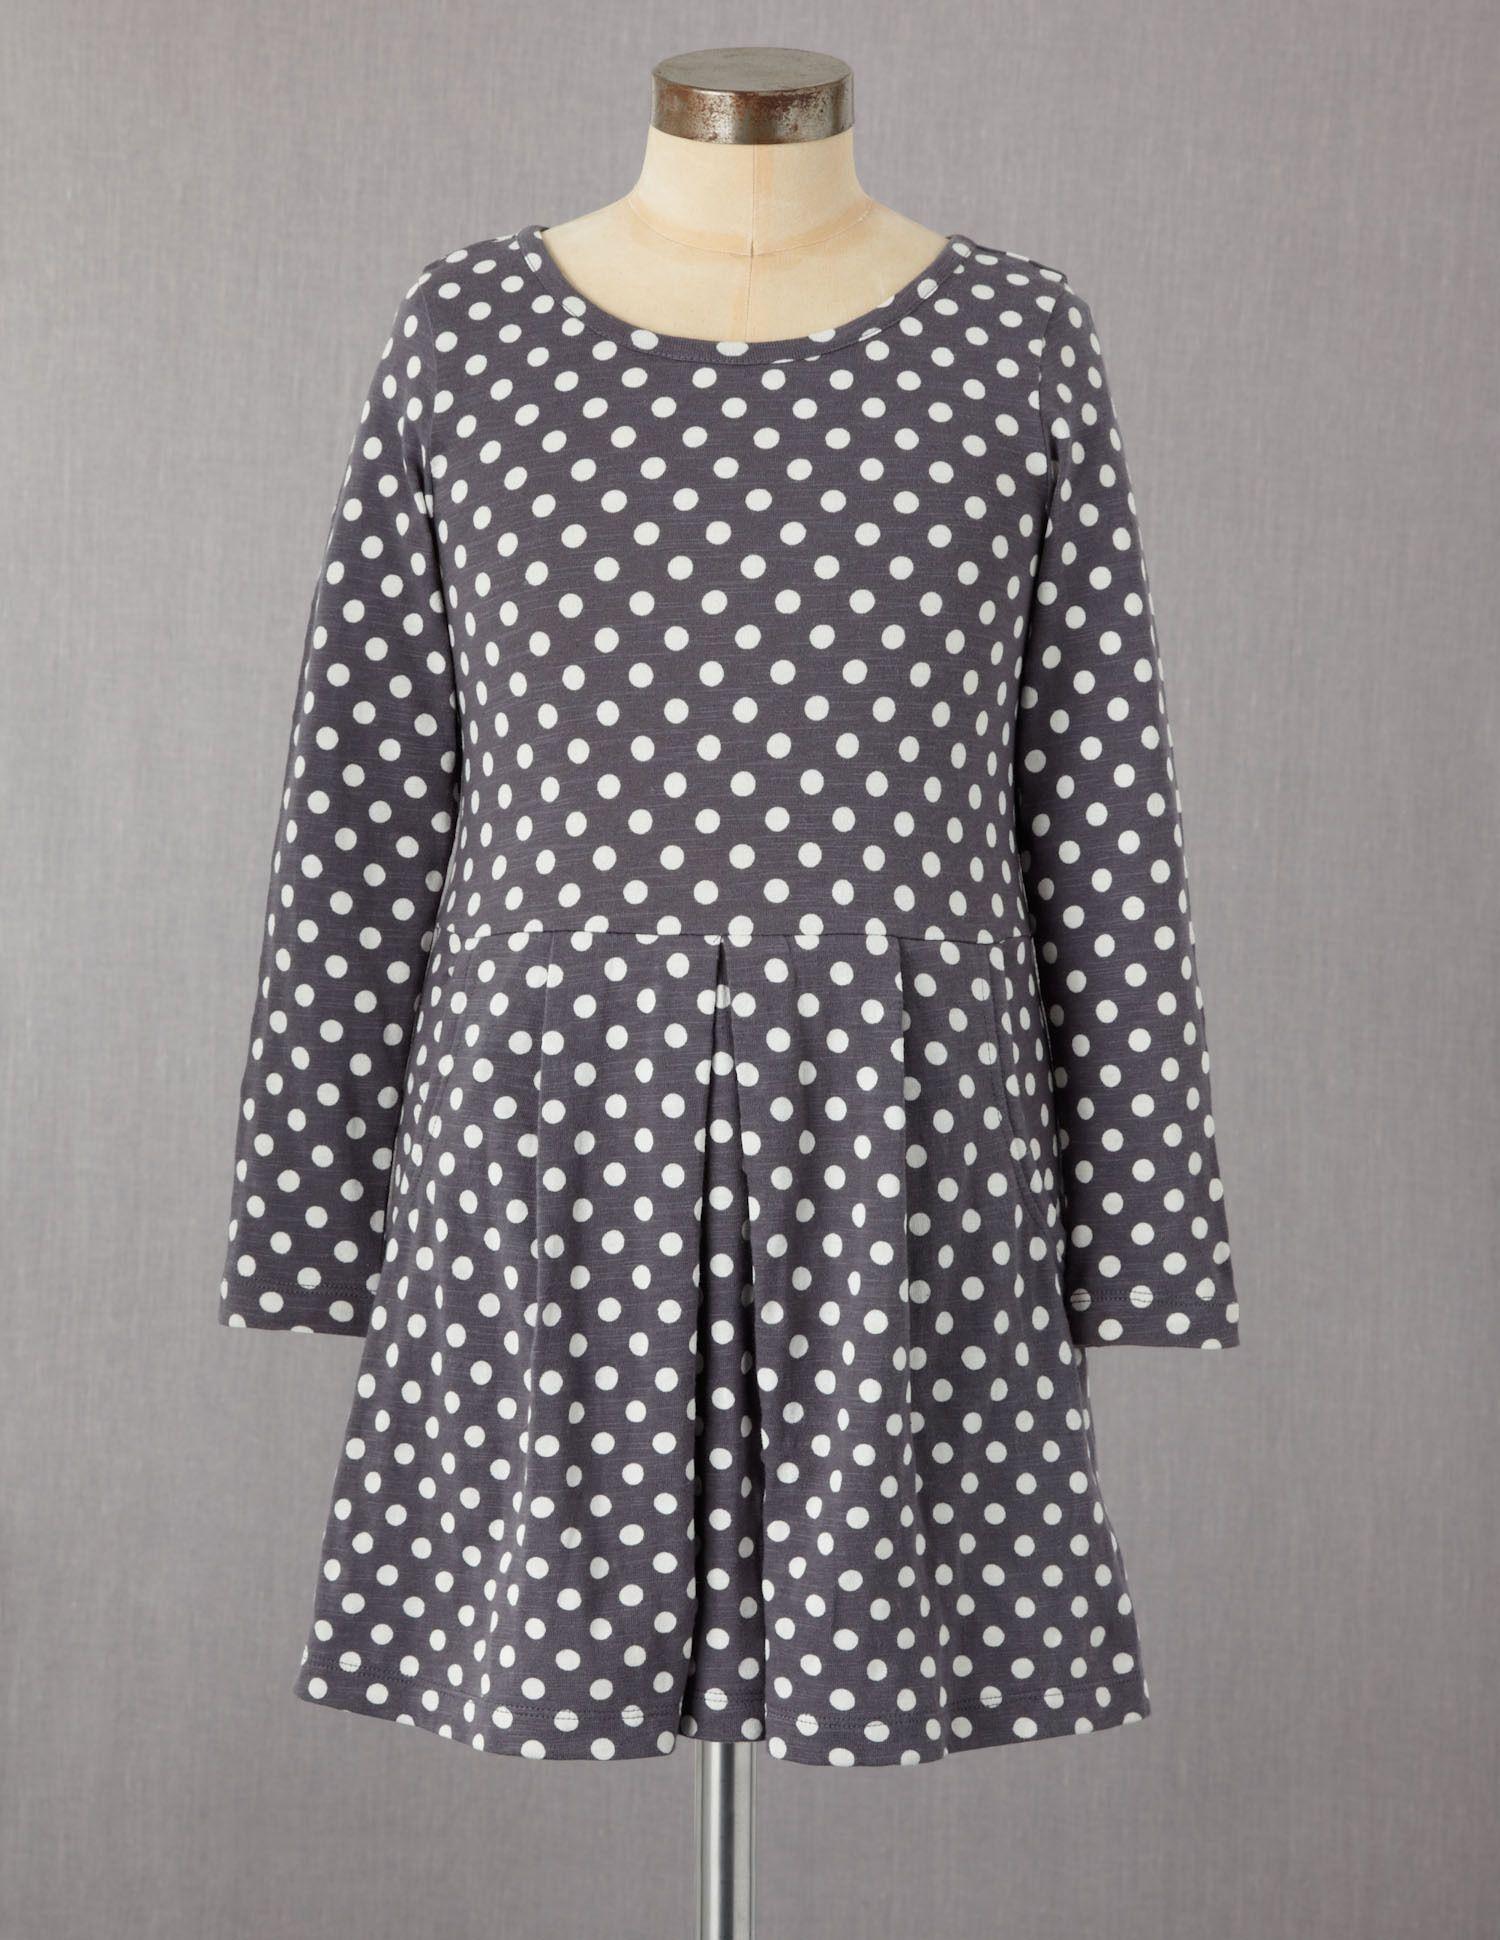 Slouchy Jersey Polka Dot Dress